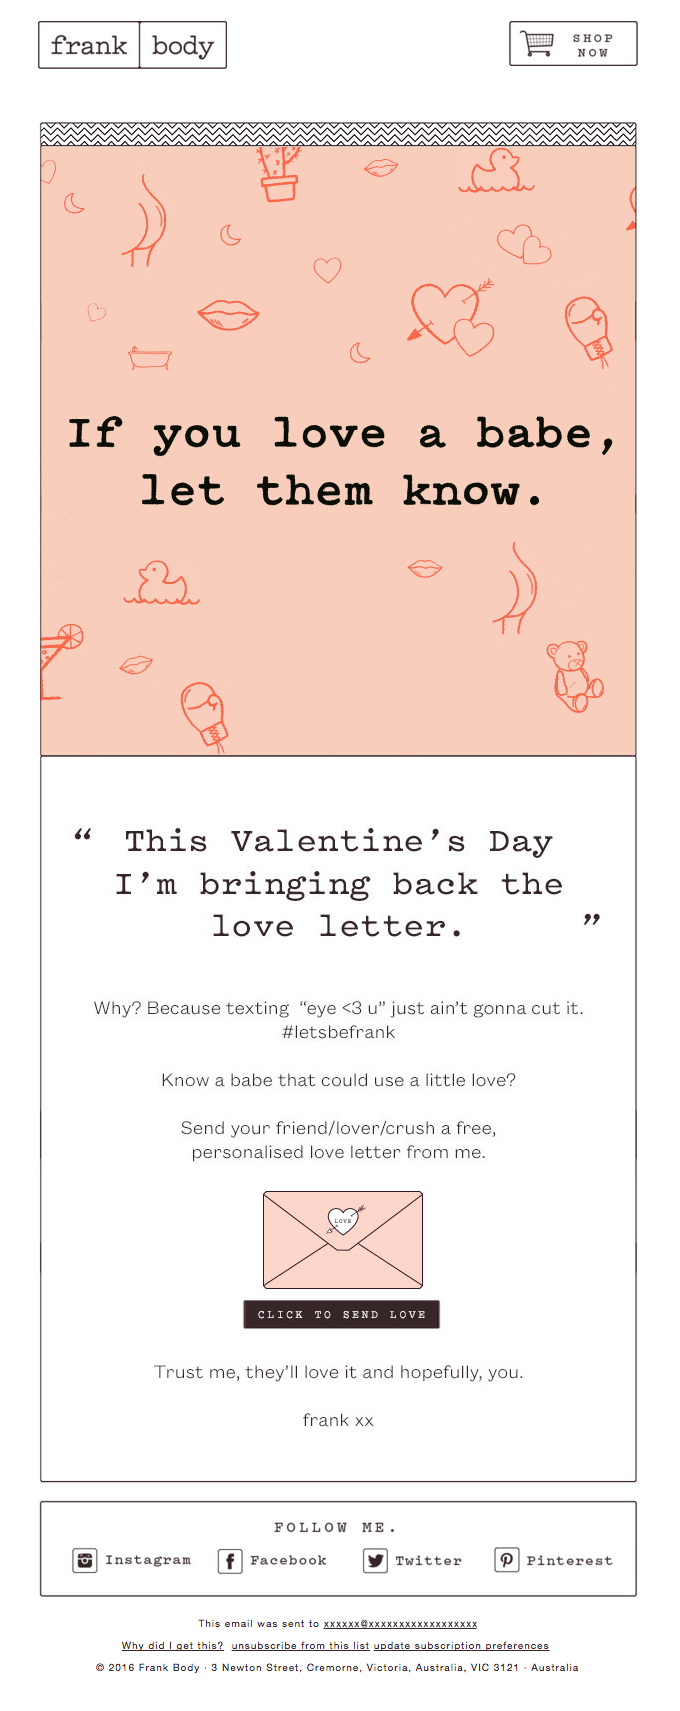 Frank Body love letter example